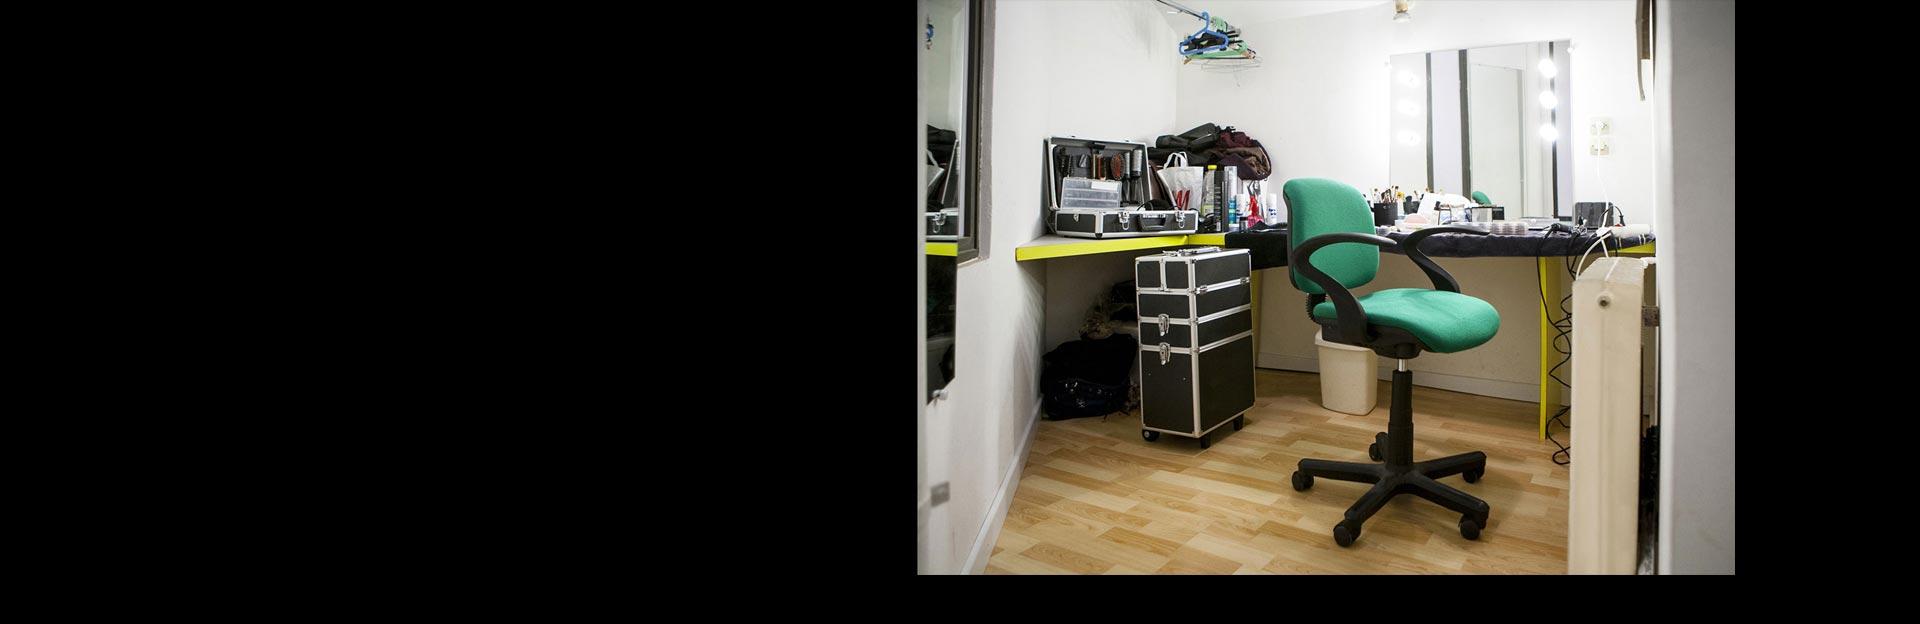 Studio photo Strasbourg Bas-Rhin 67 - Cabine mannequin